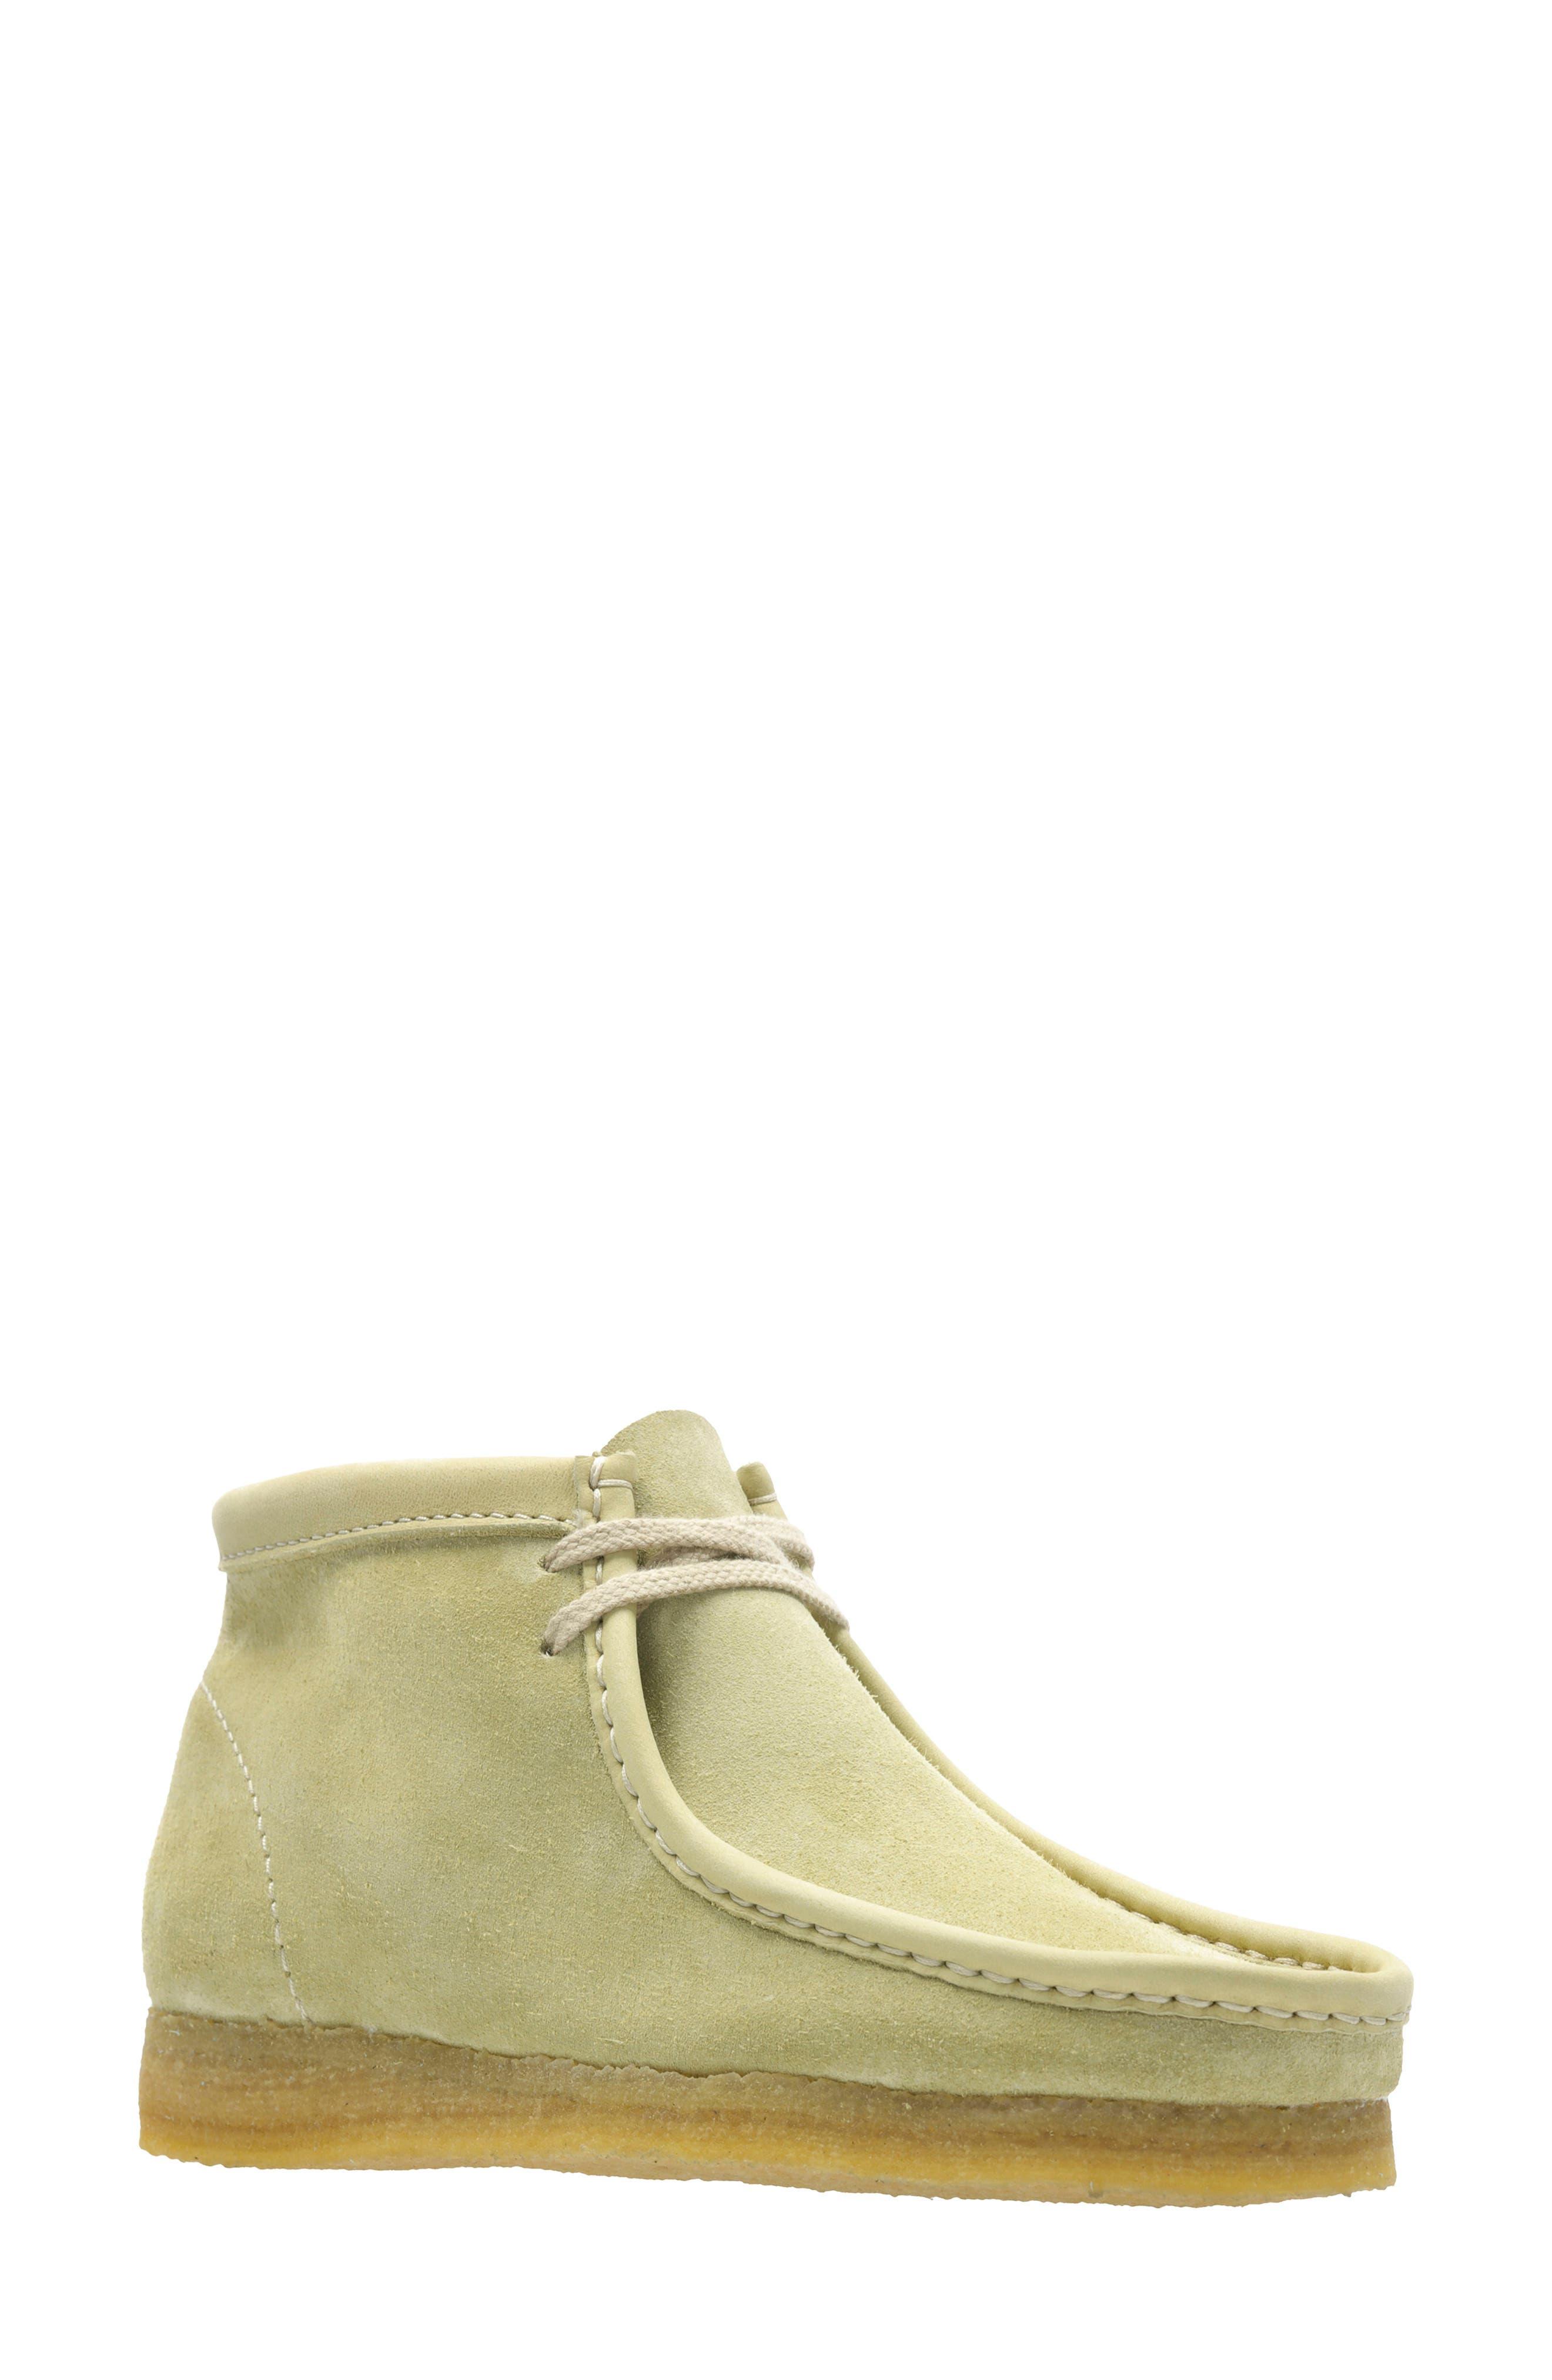 Women's Clarks Originals Wallabee Chukka Boot